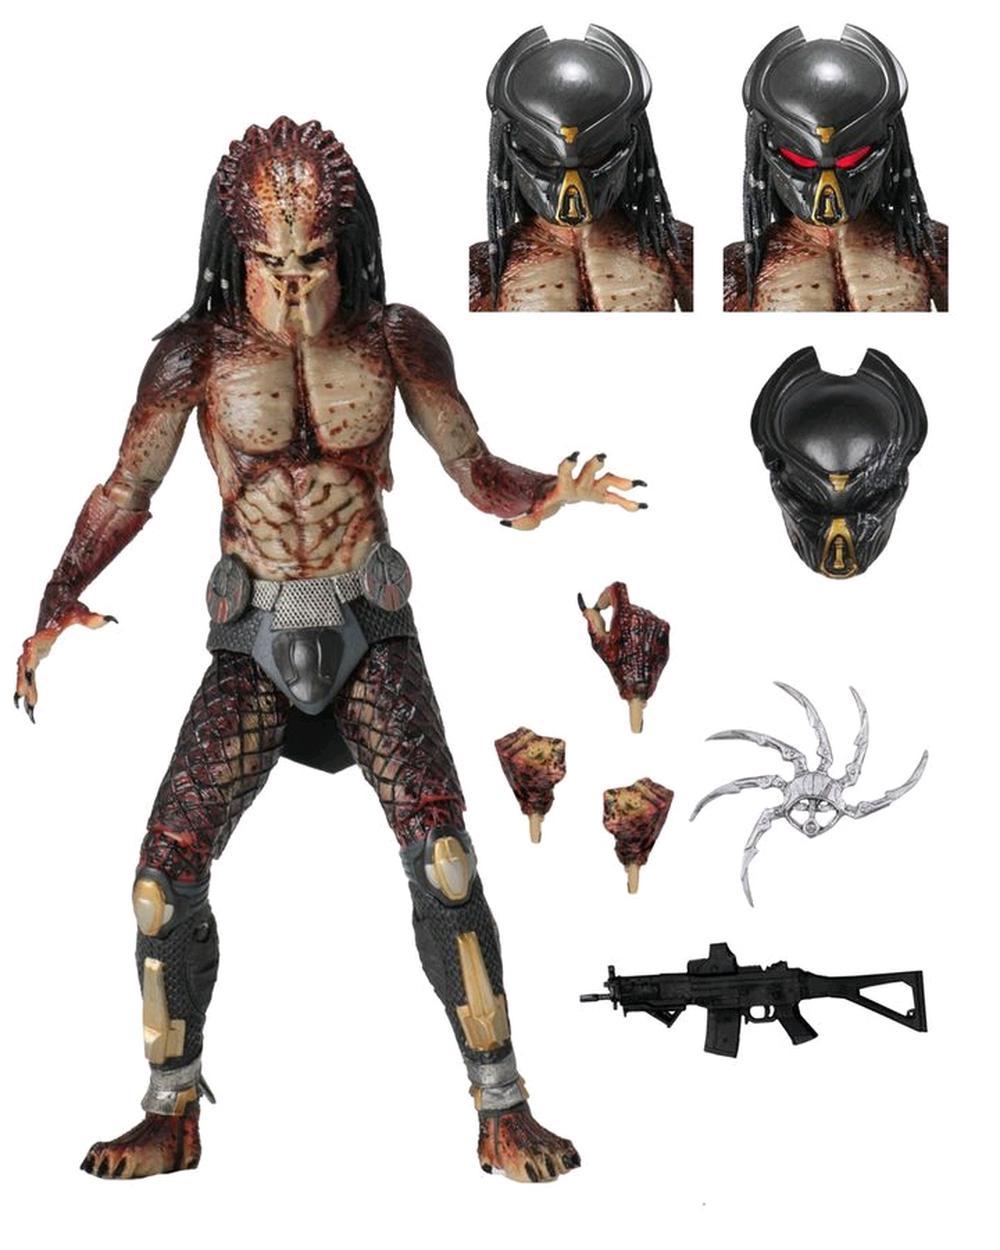 NECA Predators 2 Battle Armor Lost Predator Wasp Predator PVC Action Figure Coll